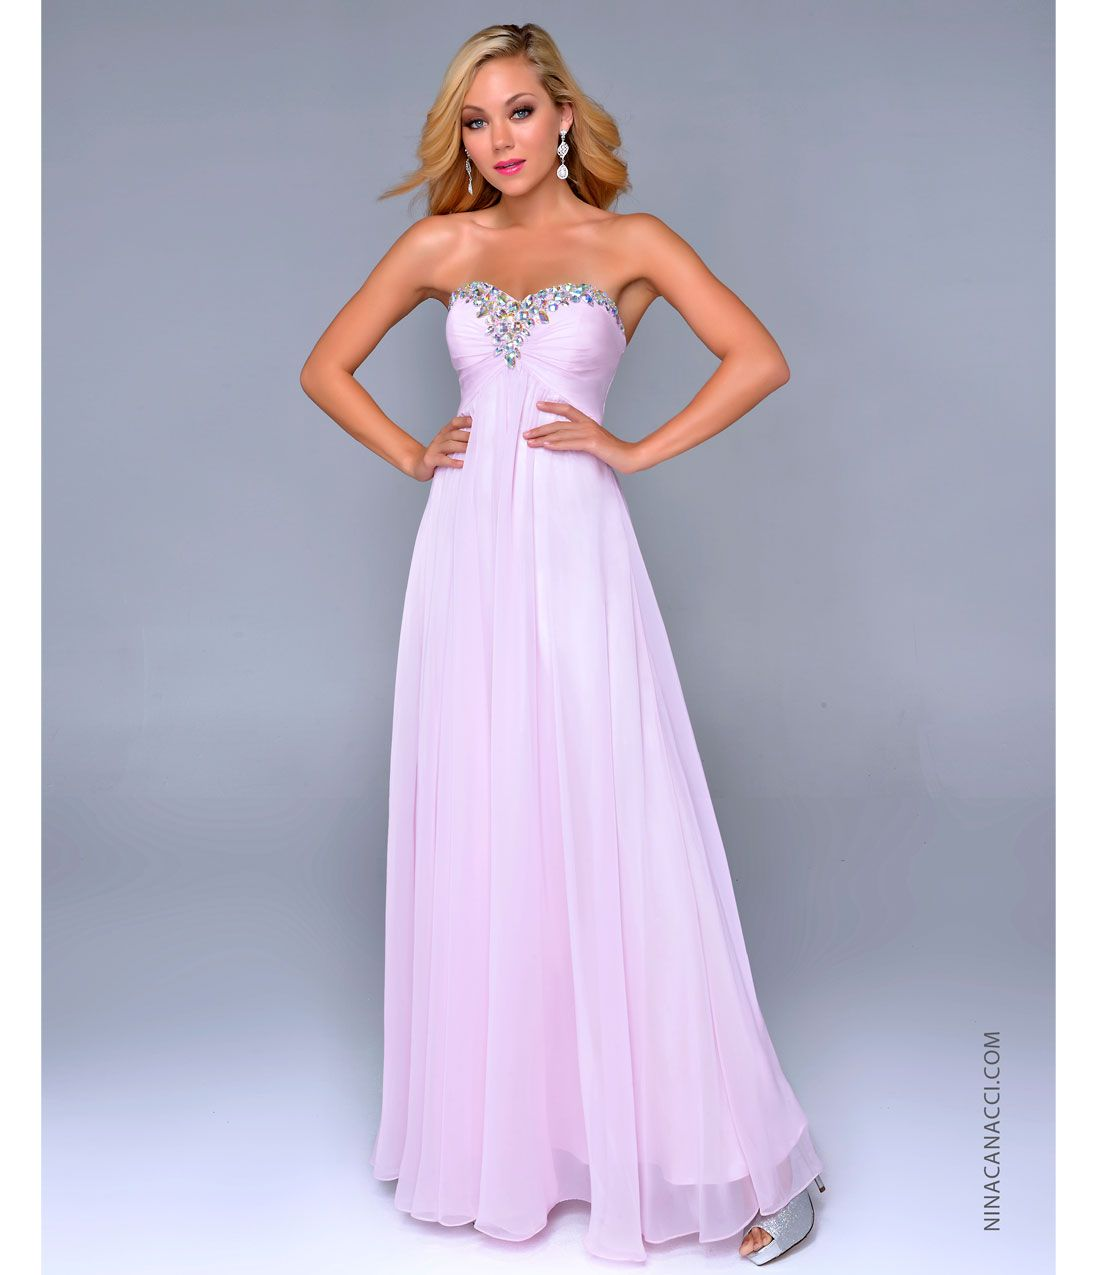 Nina c prom dresses you can rent